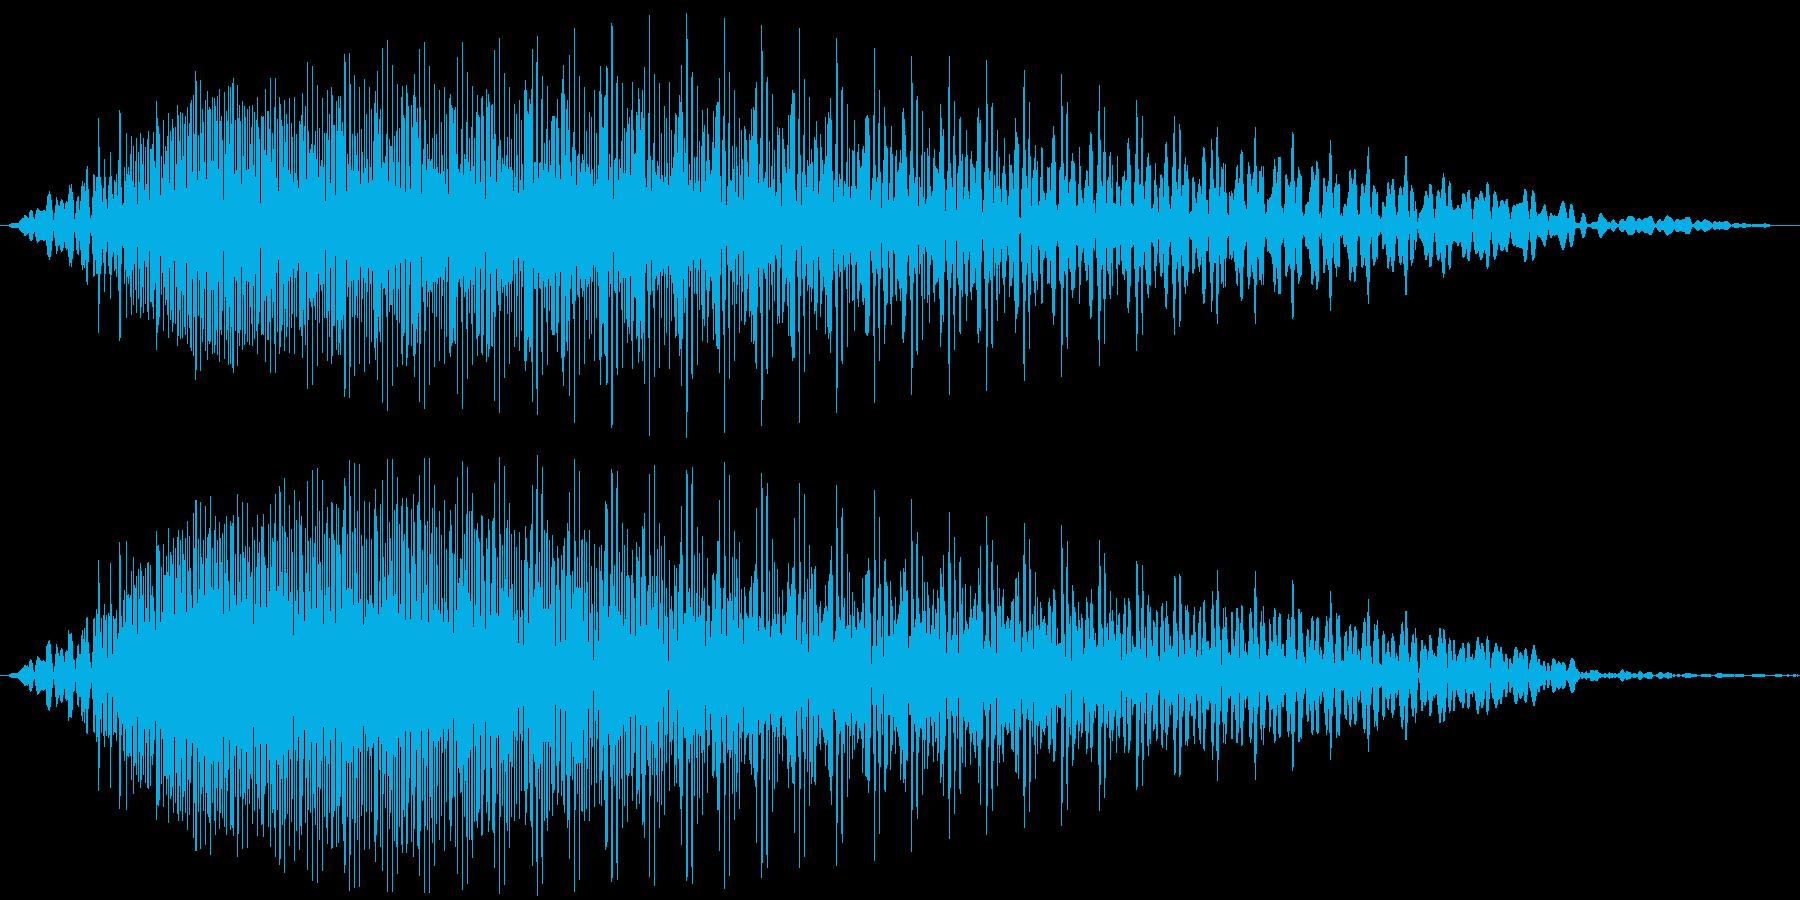 Beam 重低音の利いた攻撃的なビーム音の再生済みの波形